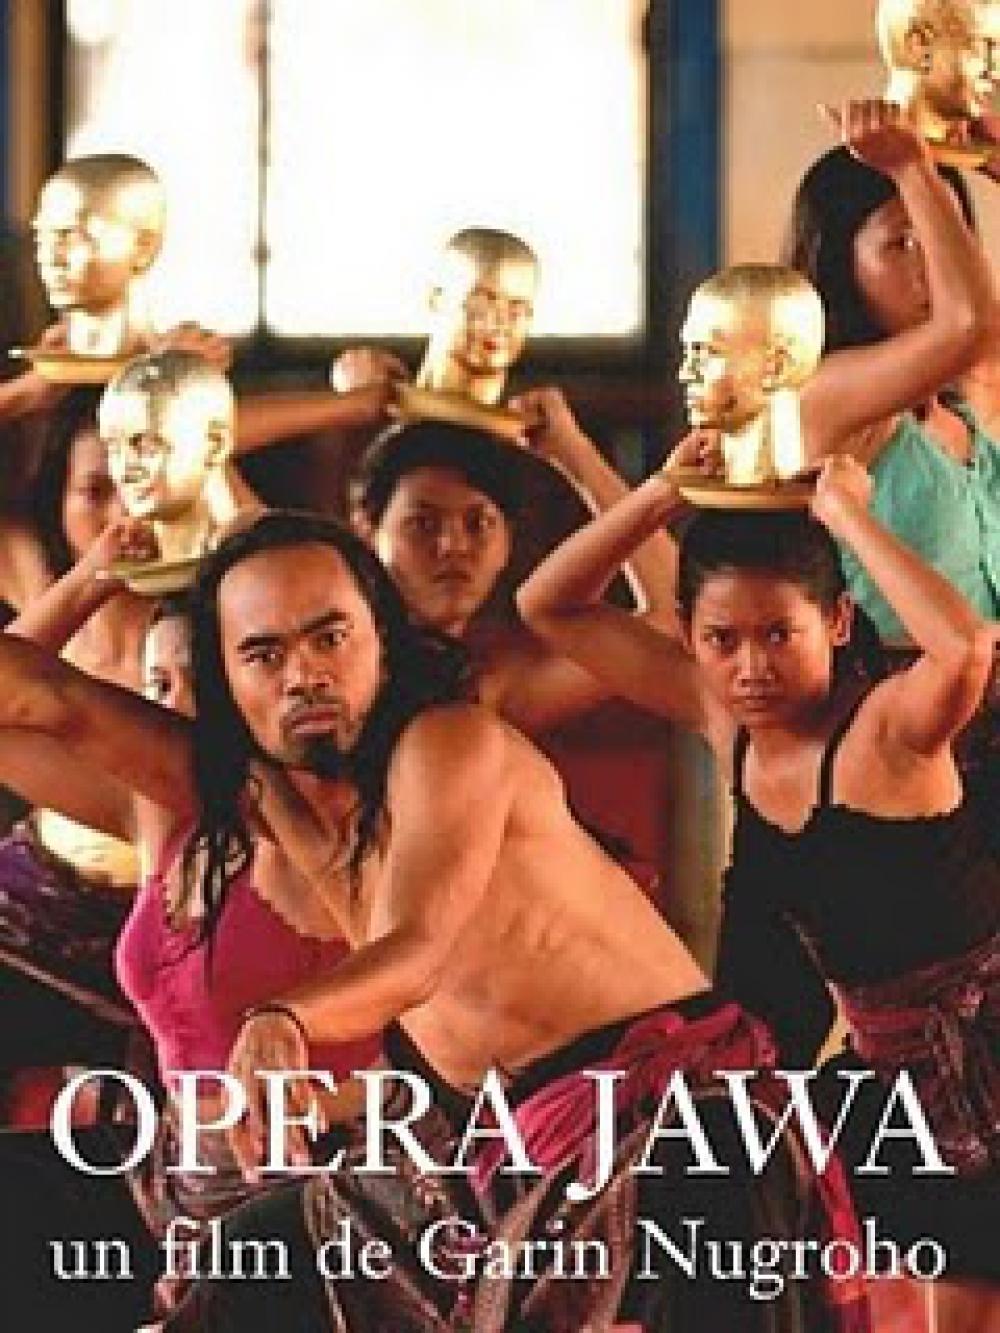 Opera Jawa Comes to Paris